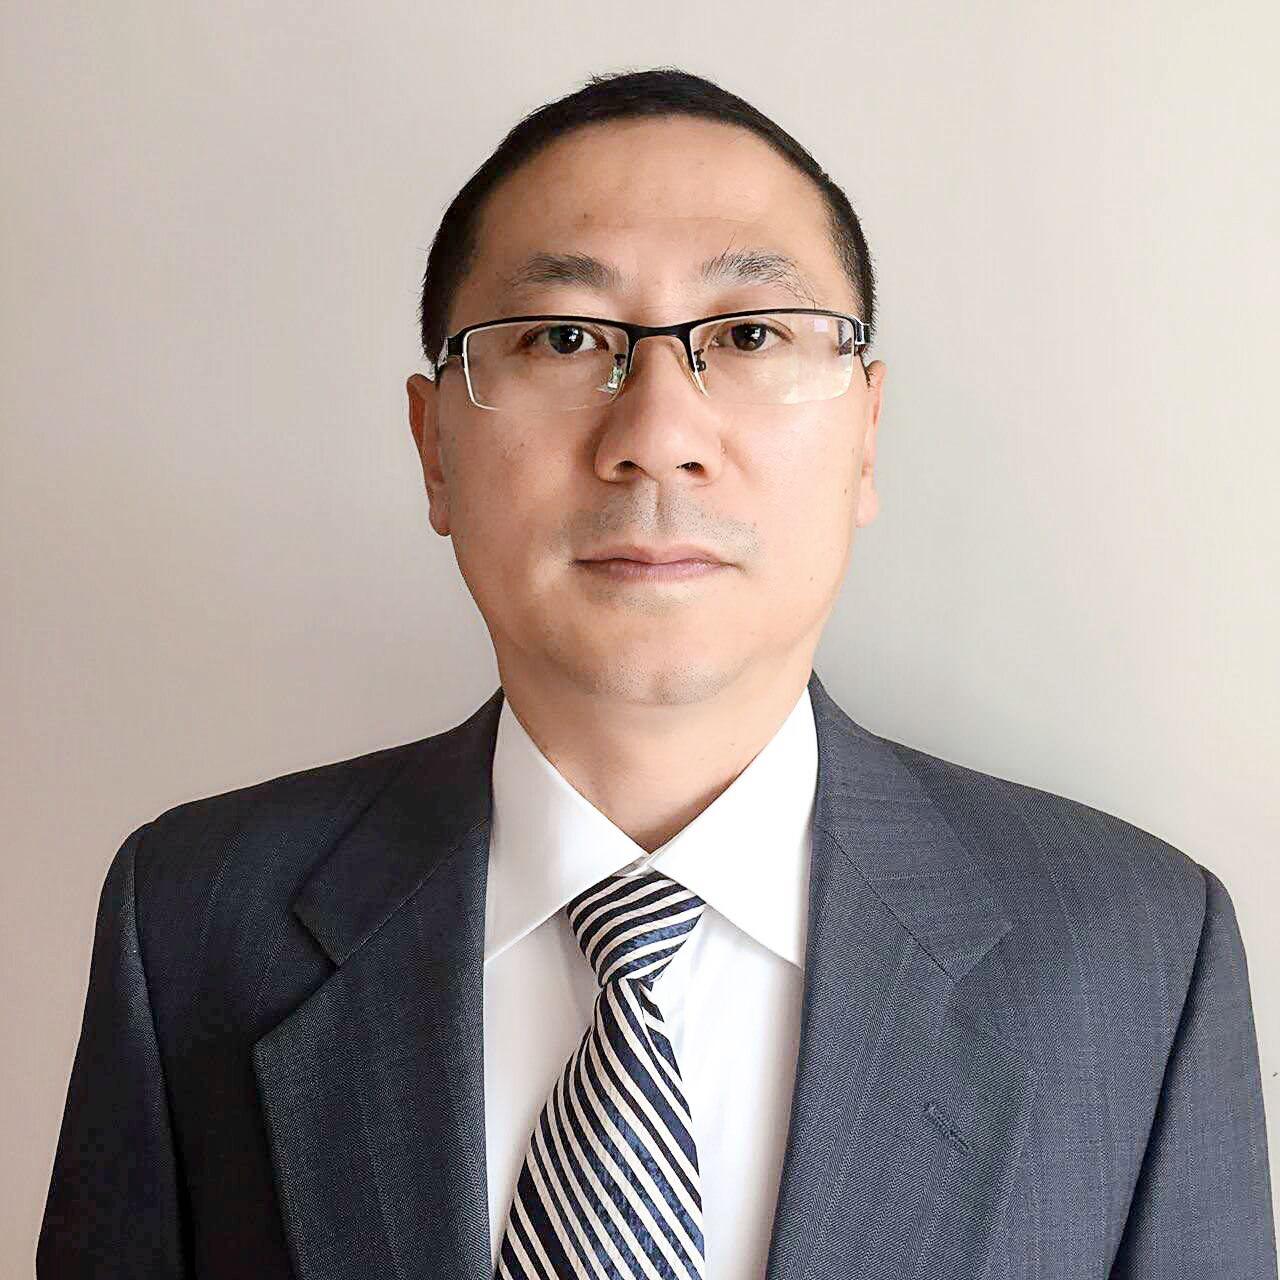 Cui Wei